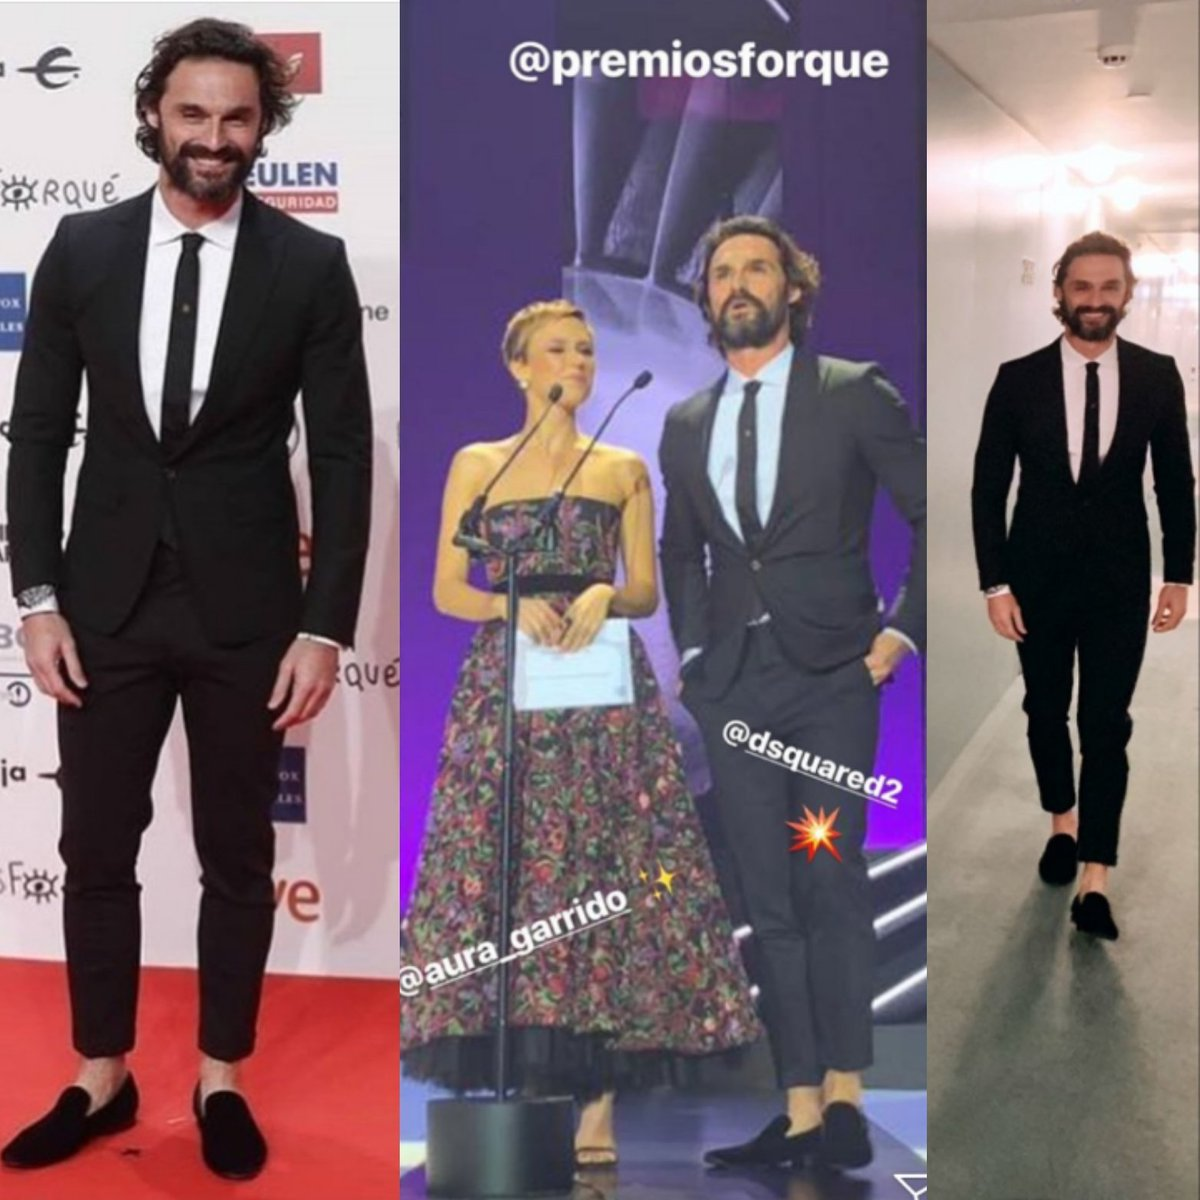 RasaPoc's photo on #PremiosForqué